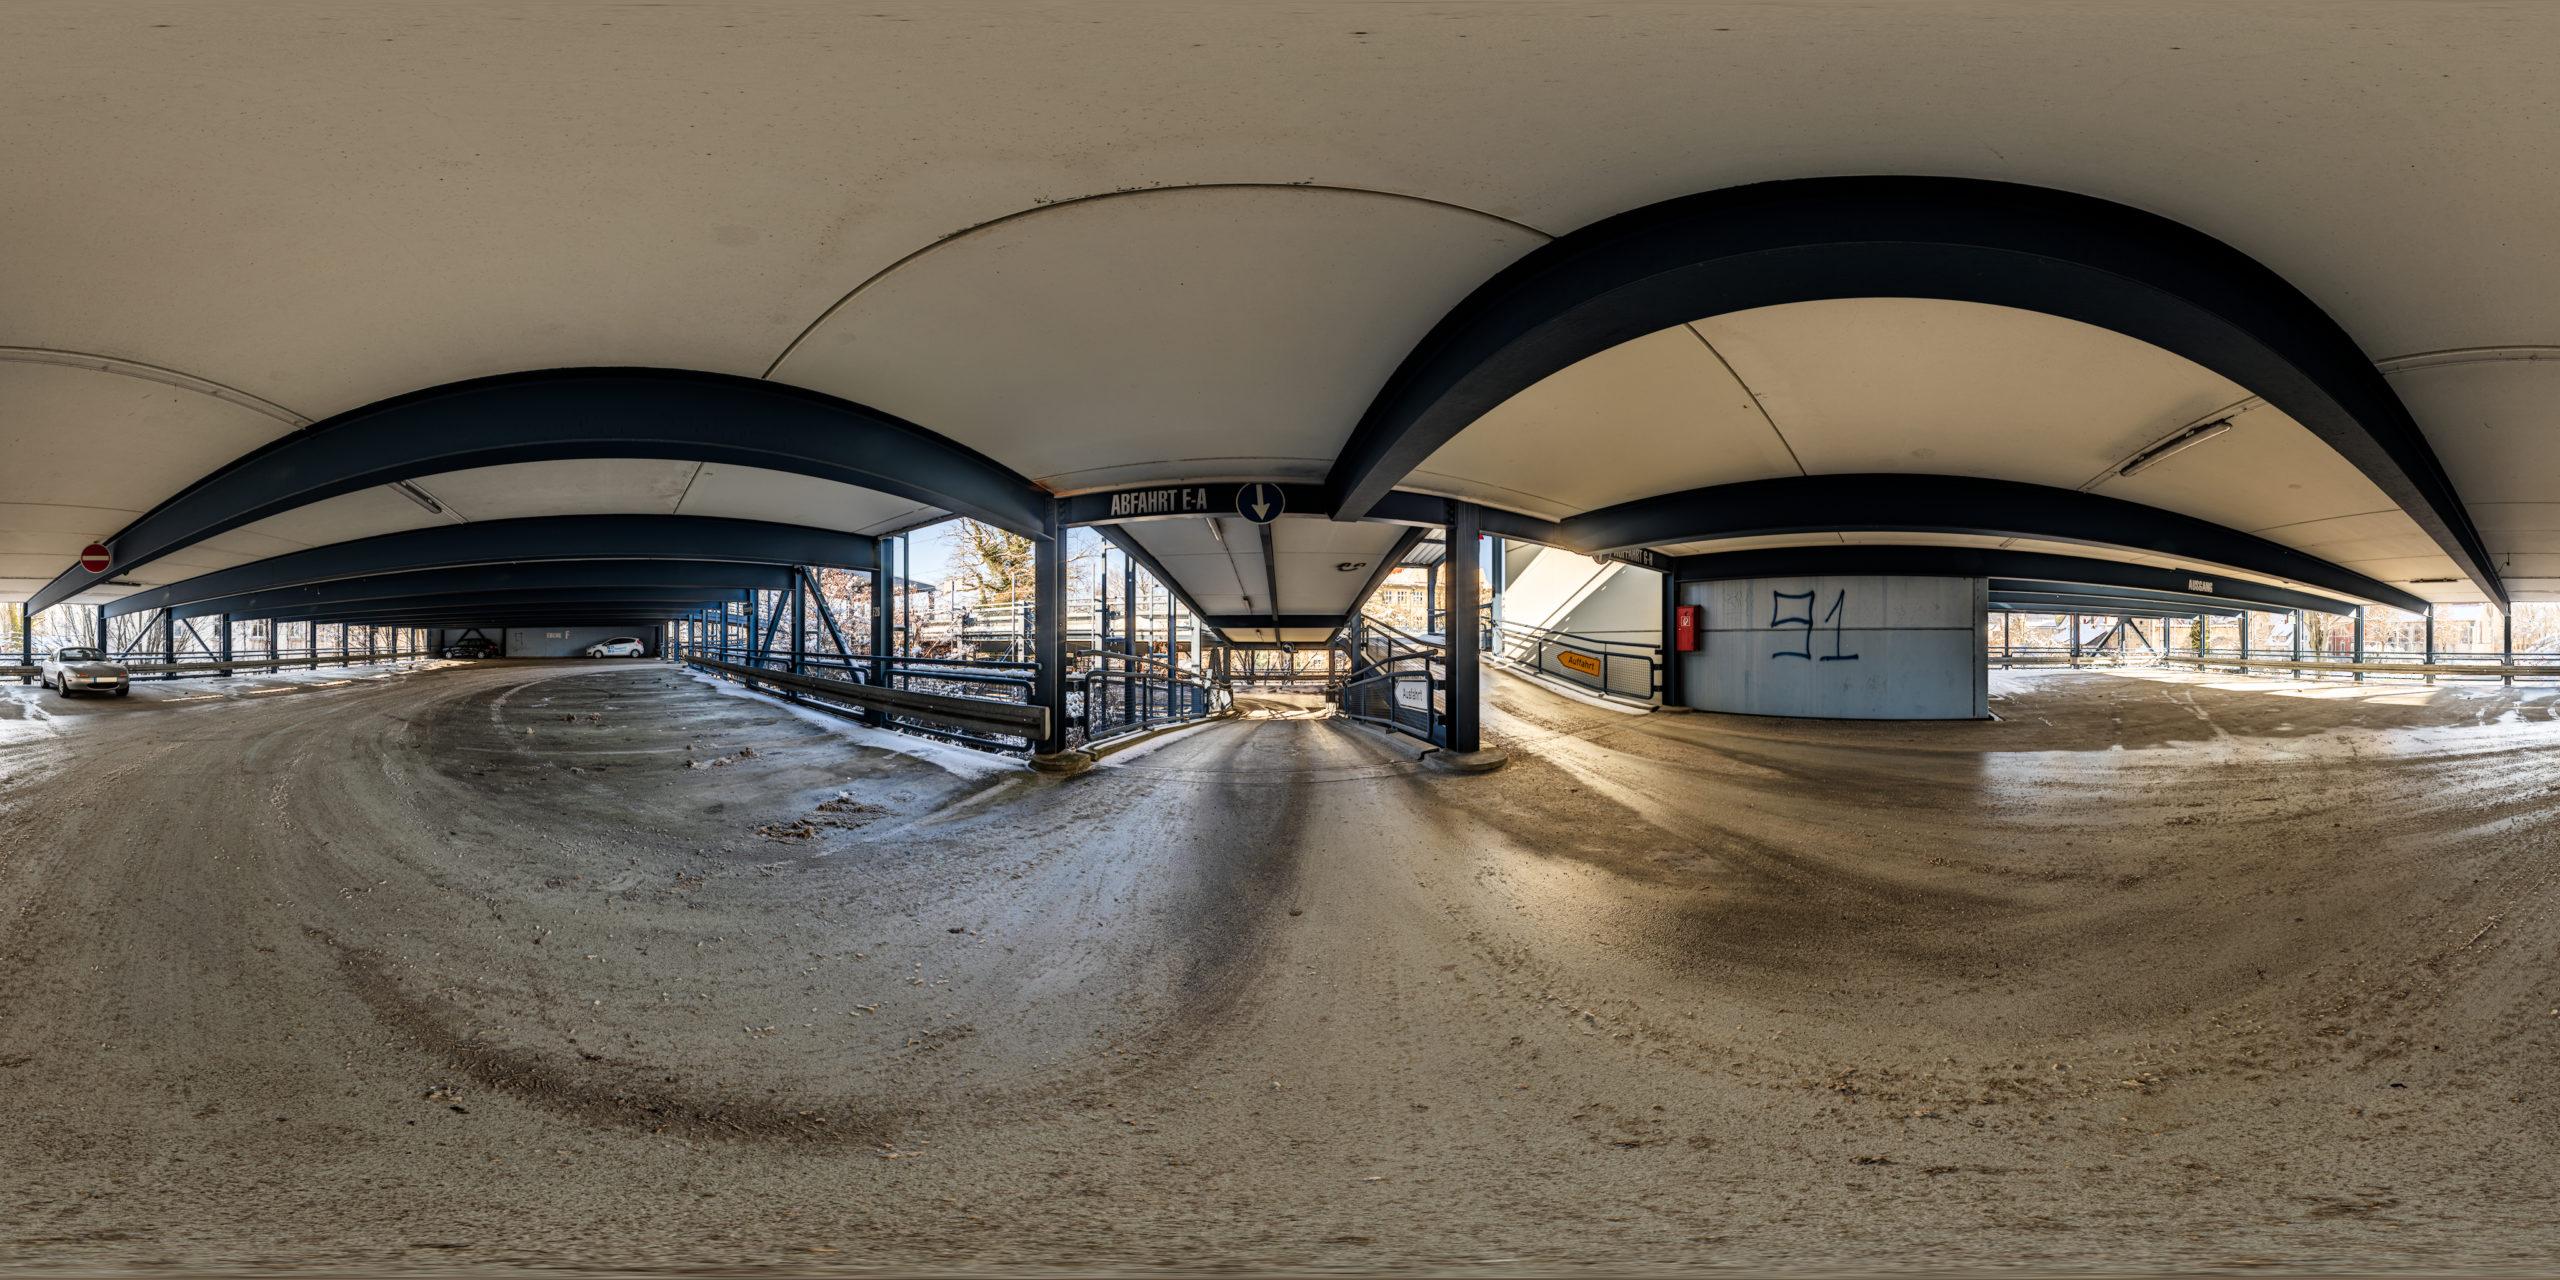 HDRI-Skies-Parking-Garage-Weißenburg